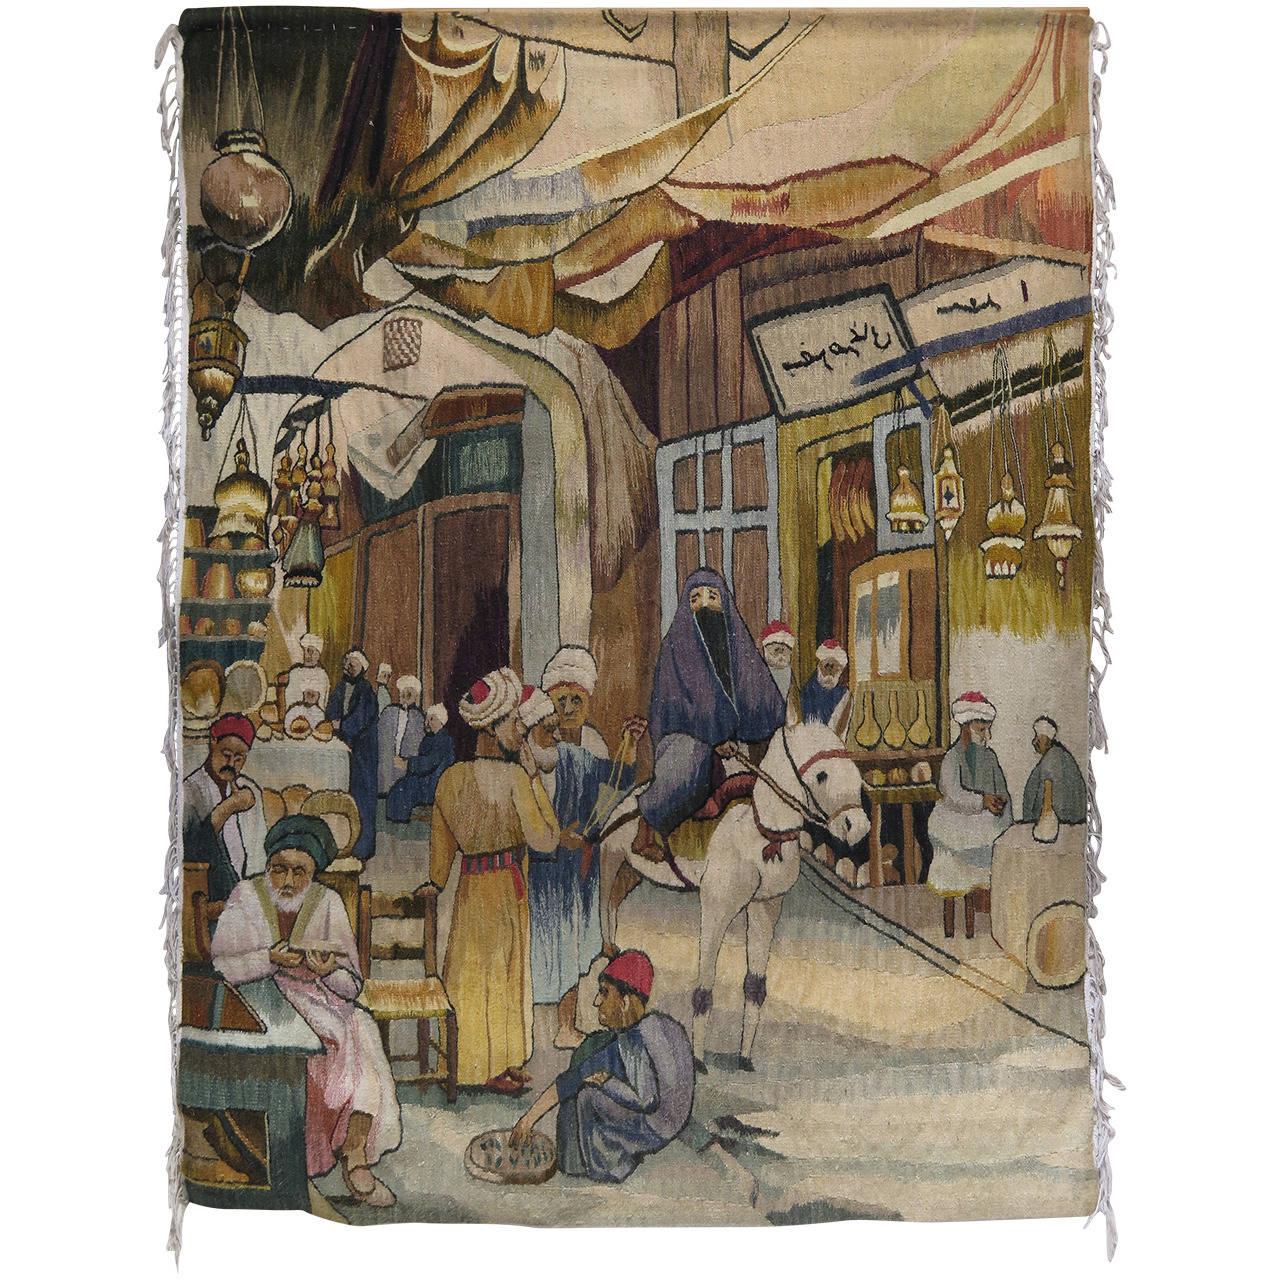 Oriental Tapestry Depicting a Street or Souk Scene